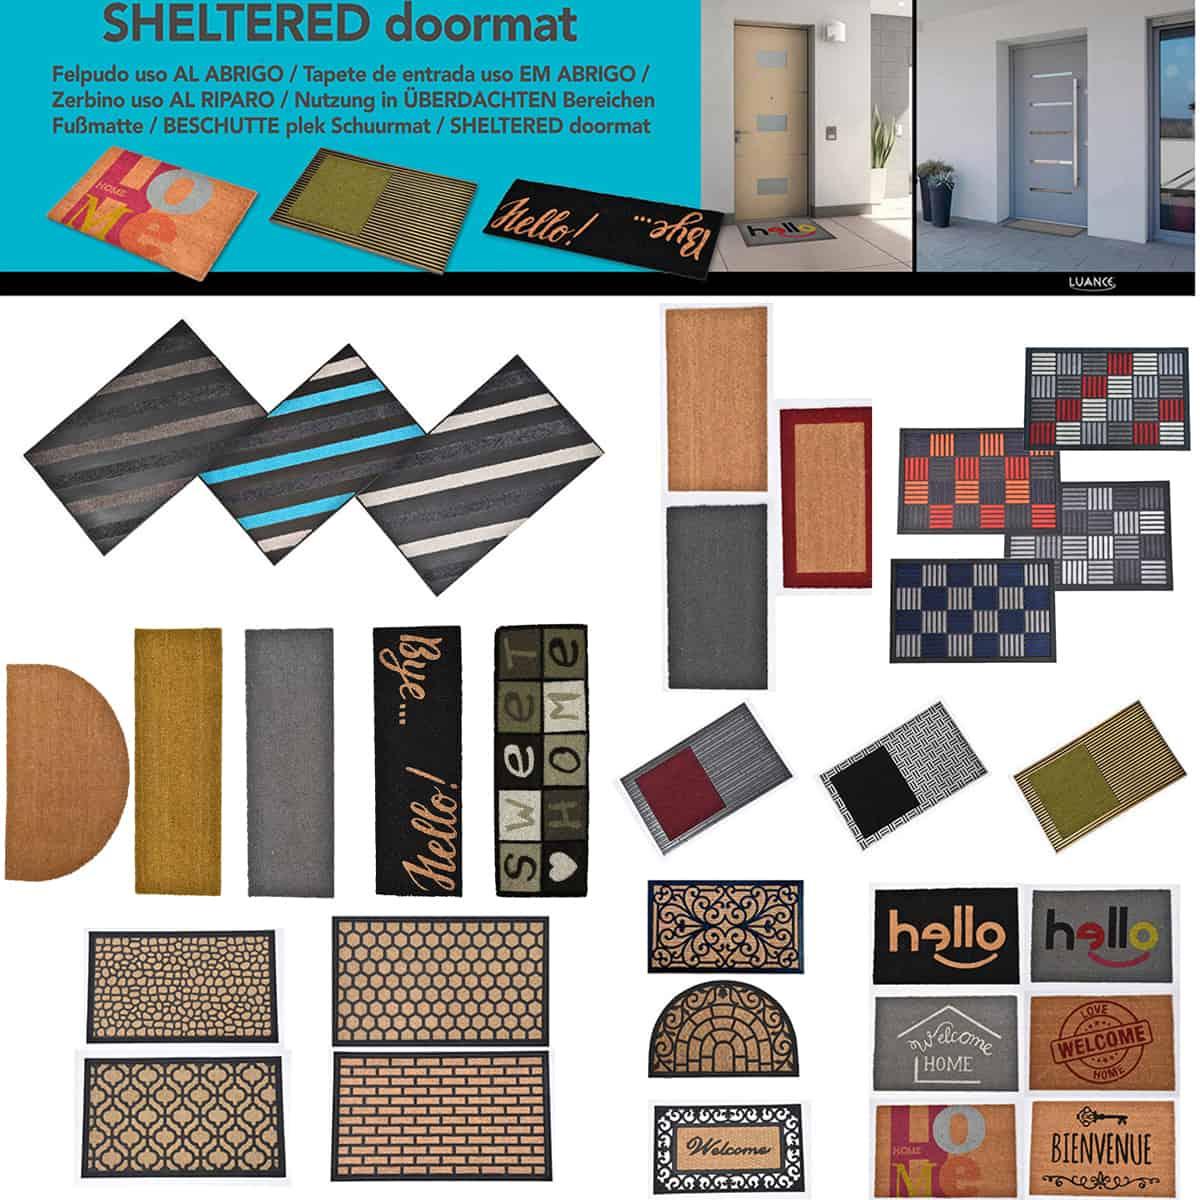 Sheltered Front Door Mat Coir Coco Fibers Rug 24x13 Natural